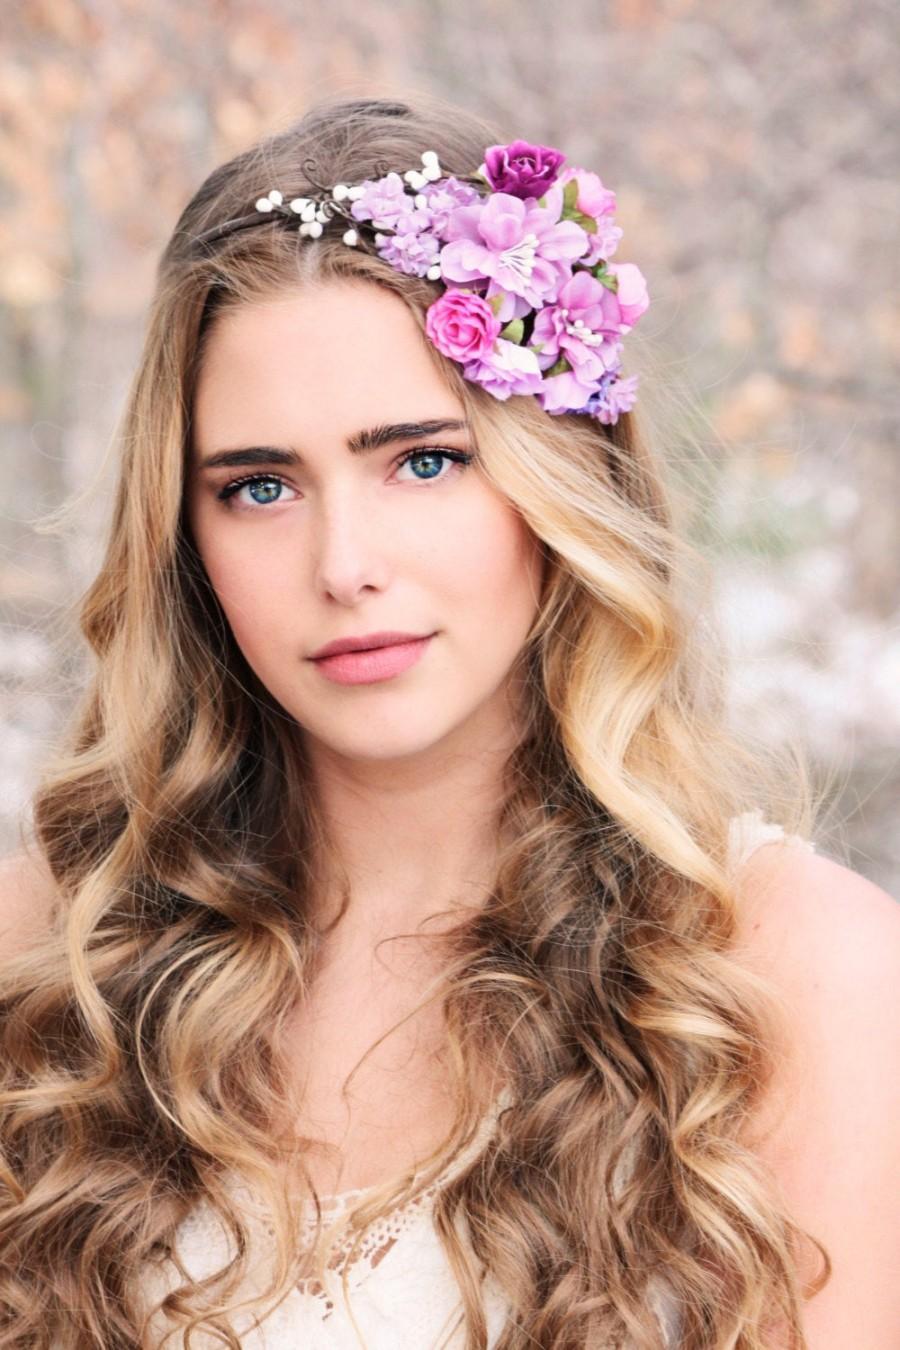 Wedding - wedding accessories, bridal flower crown, bridesmaid flower, wedding headpiece, head wreath in purple, hair accessories, bridal, flower girl